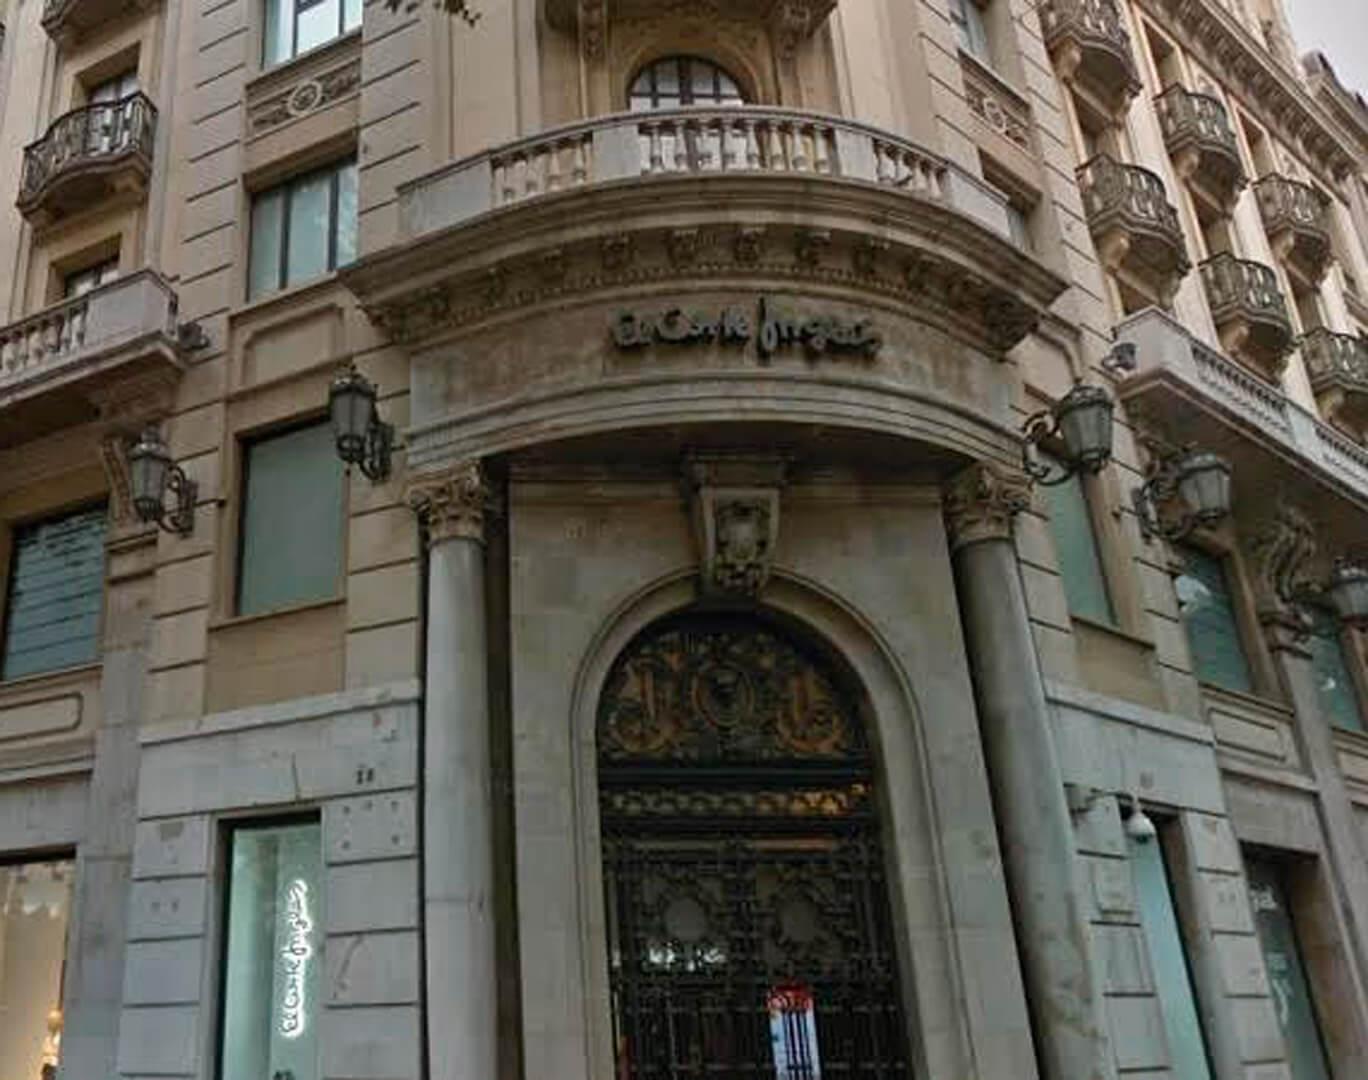 El corte ingl s de plaza catalu a cerrar sus puertas en - El corte ingles plaza cataluna barcelona ...